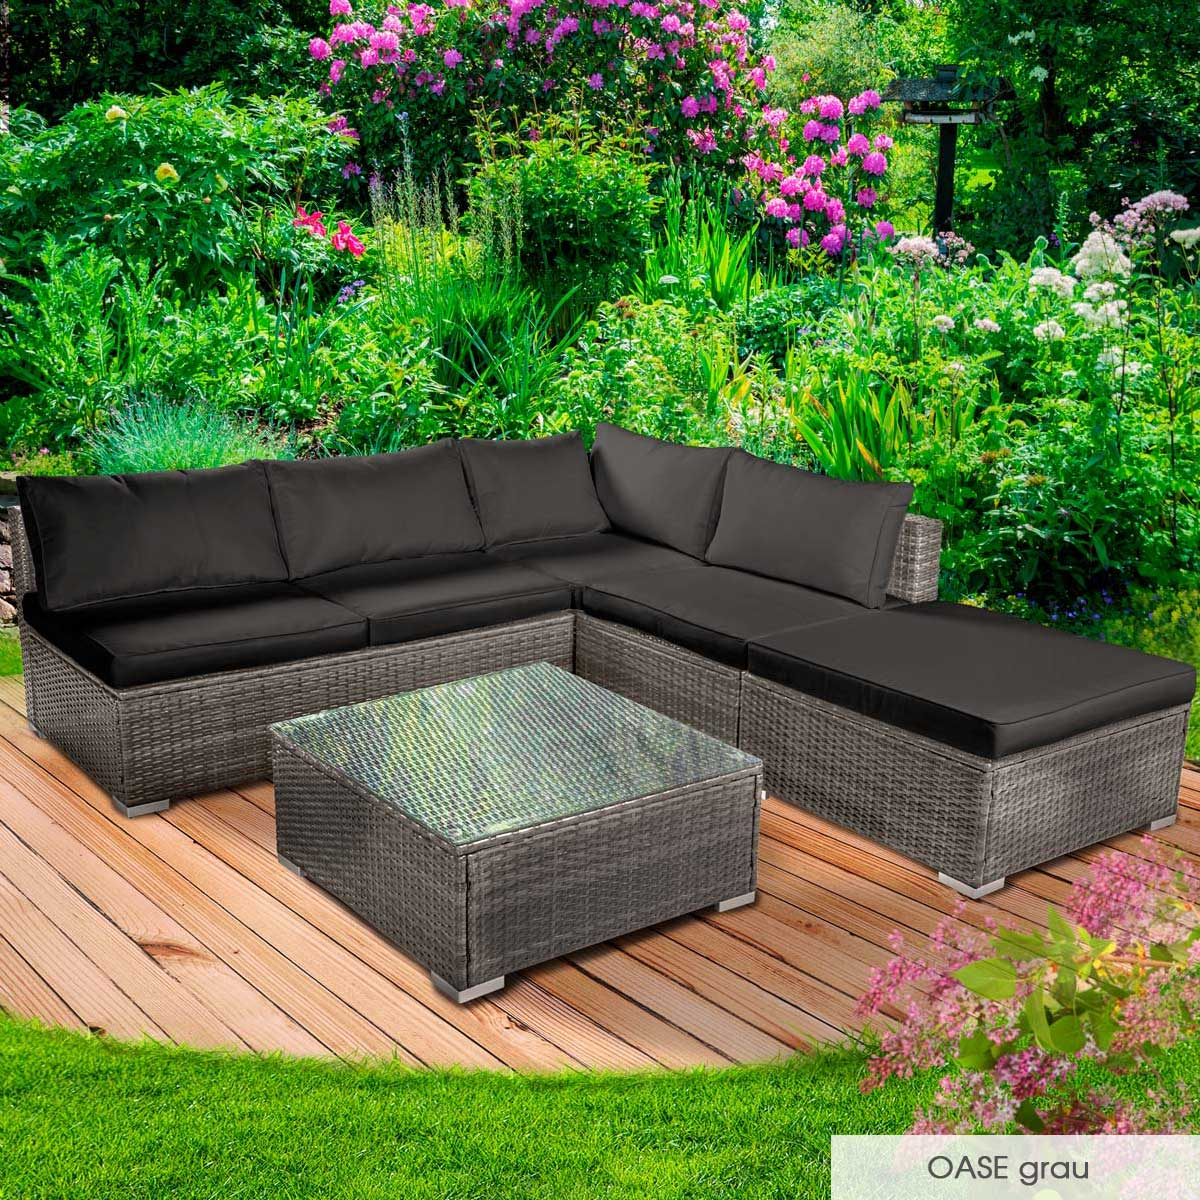 Gartenmoebel-Poly-Rattan-Lounge-Moebel-Sitzgarnitur-Gartengarnitur-Sitzgruppe-Sofa Indexbild 18